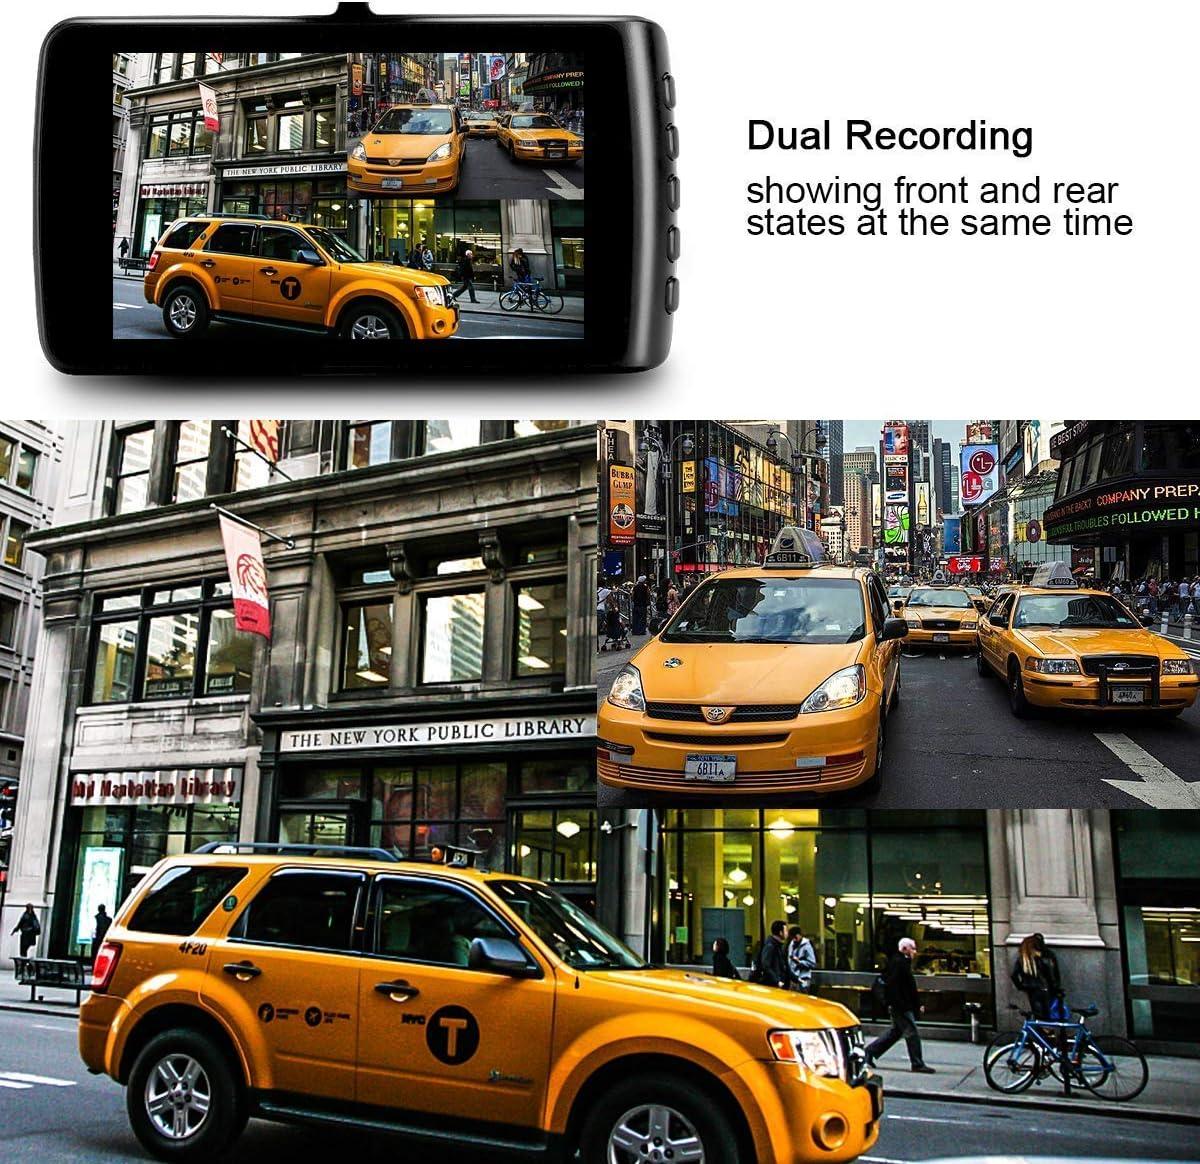 Dash Cam Wide-Angle Car Video Recorder with 3.7 LCD inch Display Video G-Sensor Loop Recording Car Camera Dashboard Camera Recorder Car DVR 1080P HD Night Vision Black